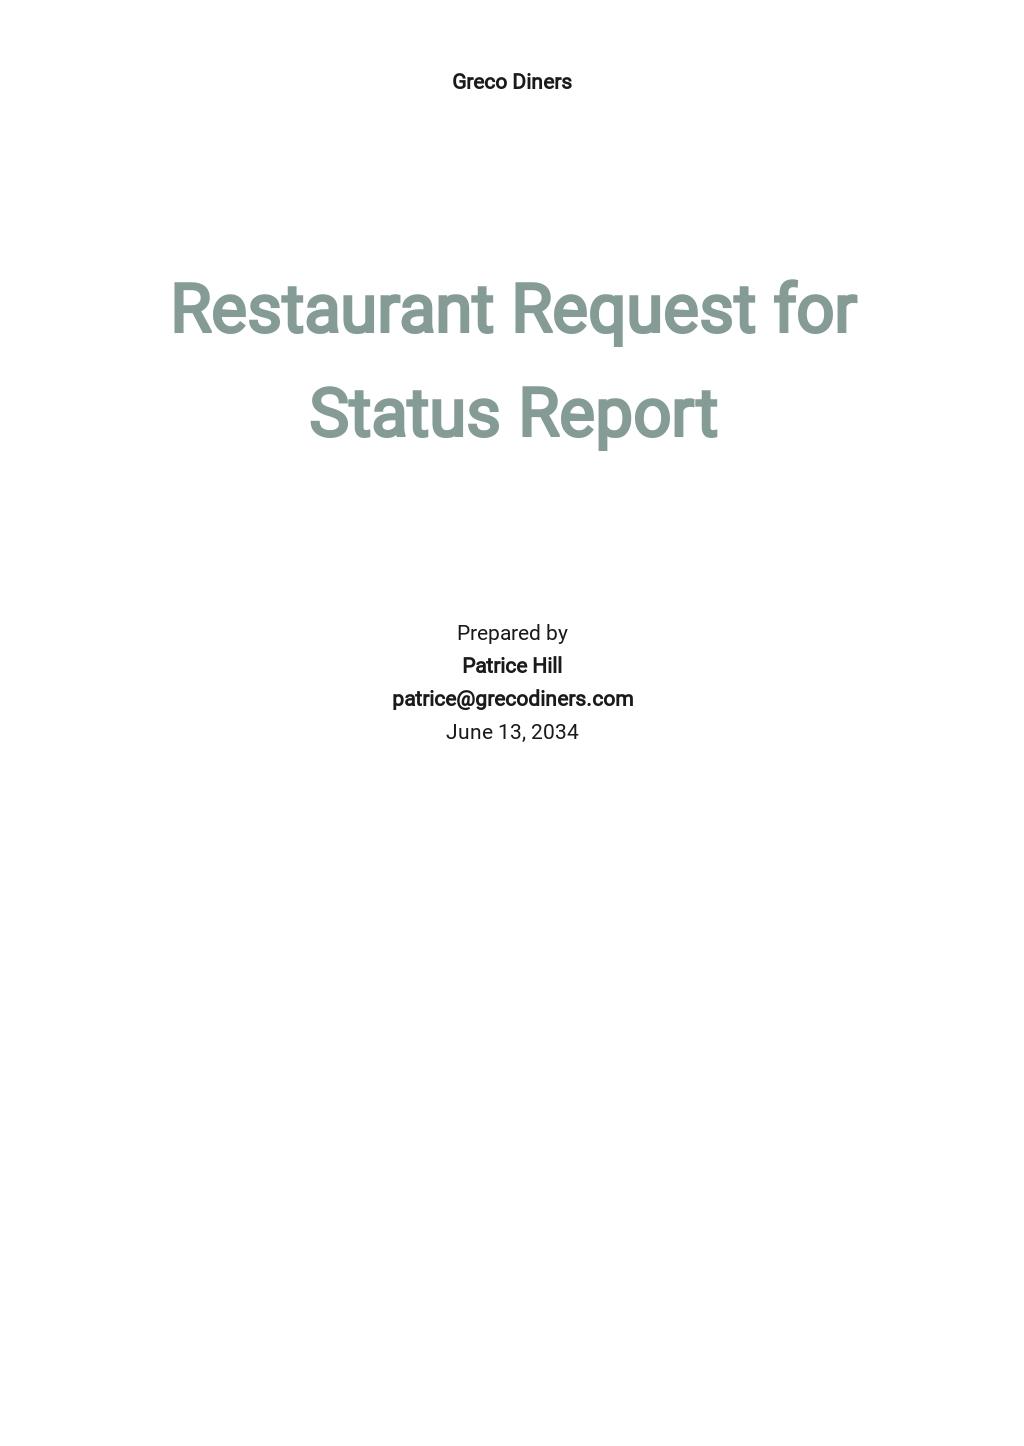 Restaurant Request for Status Report Template